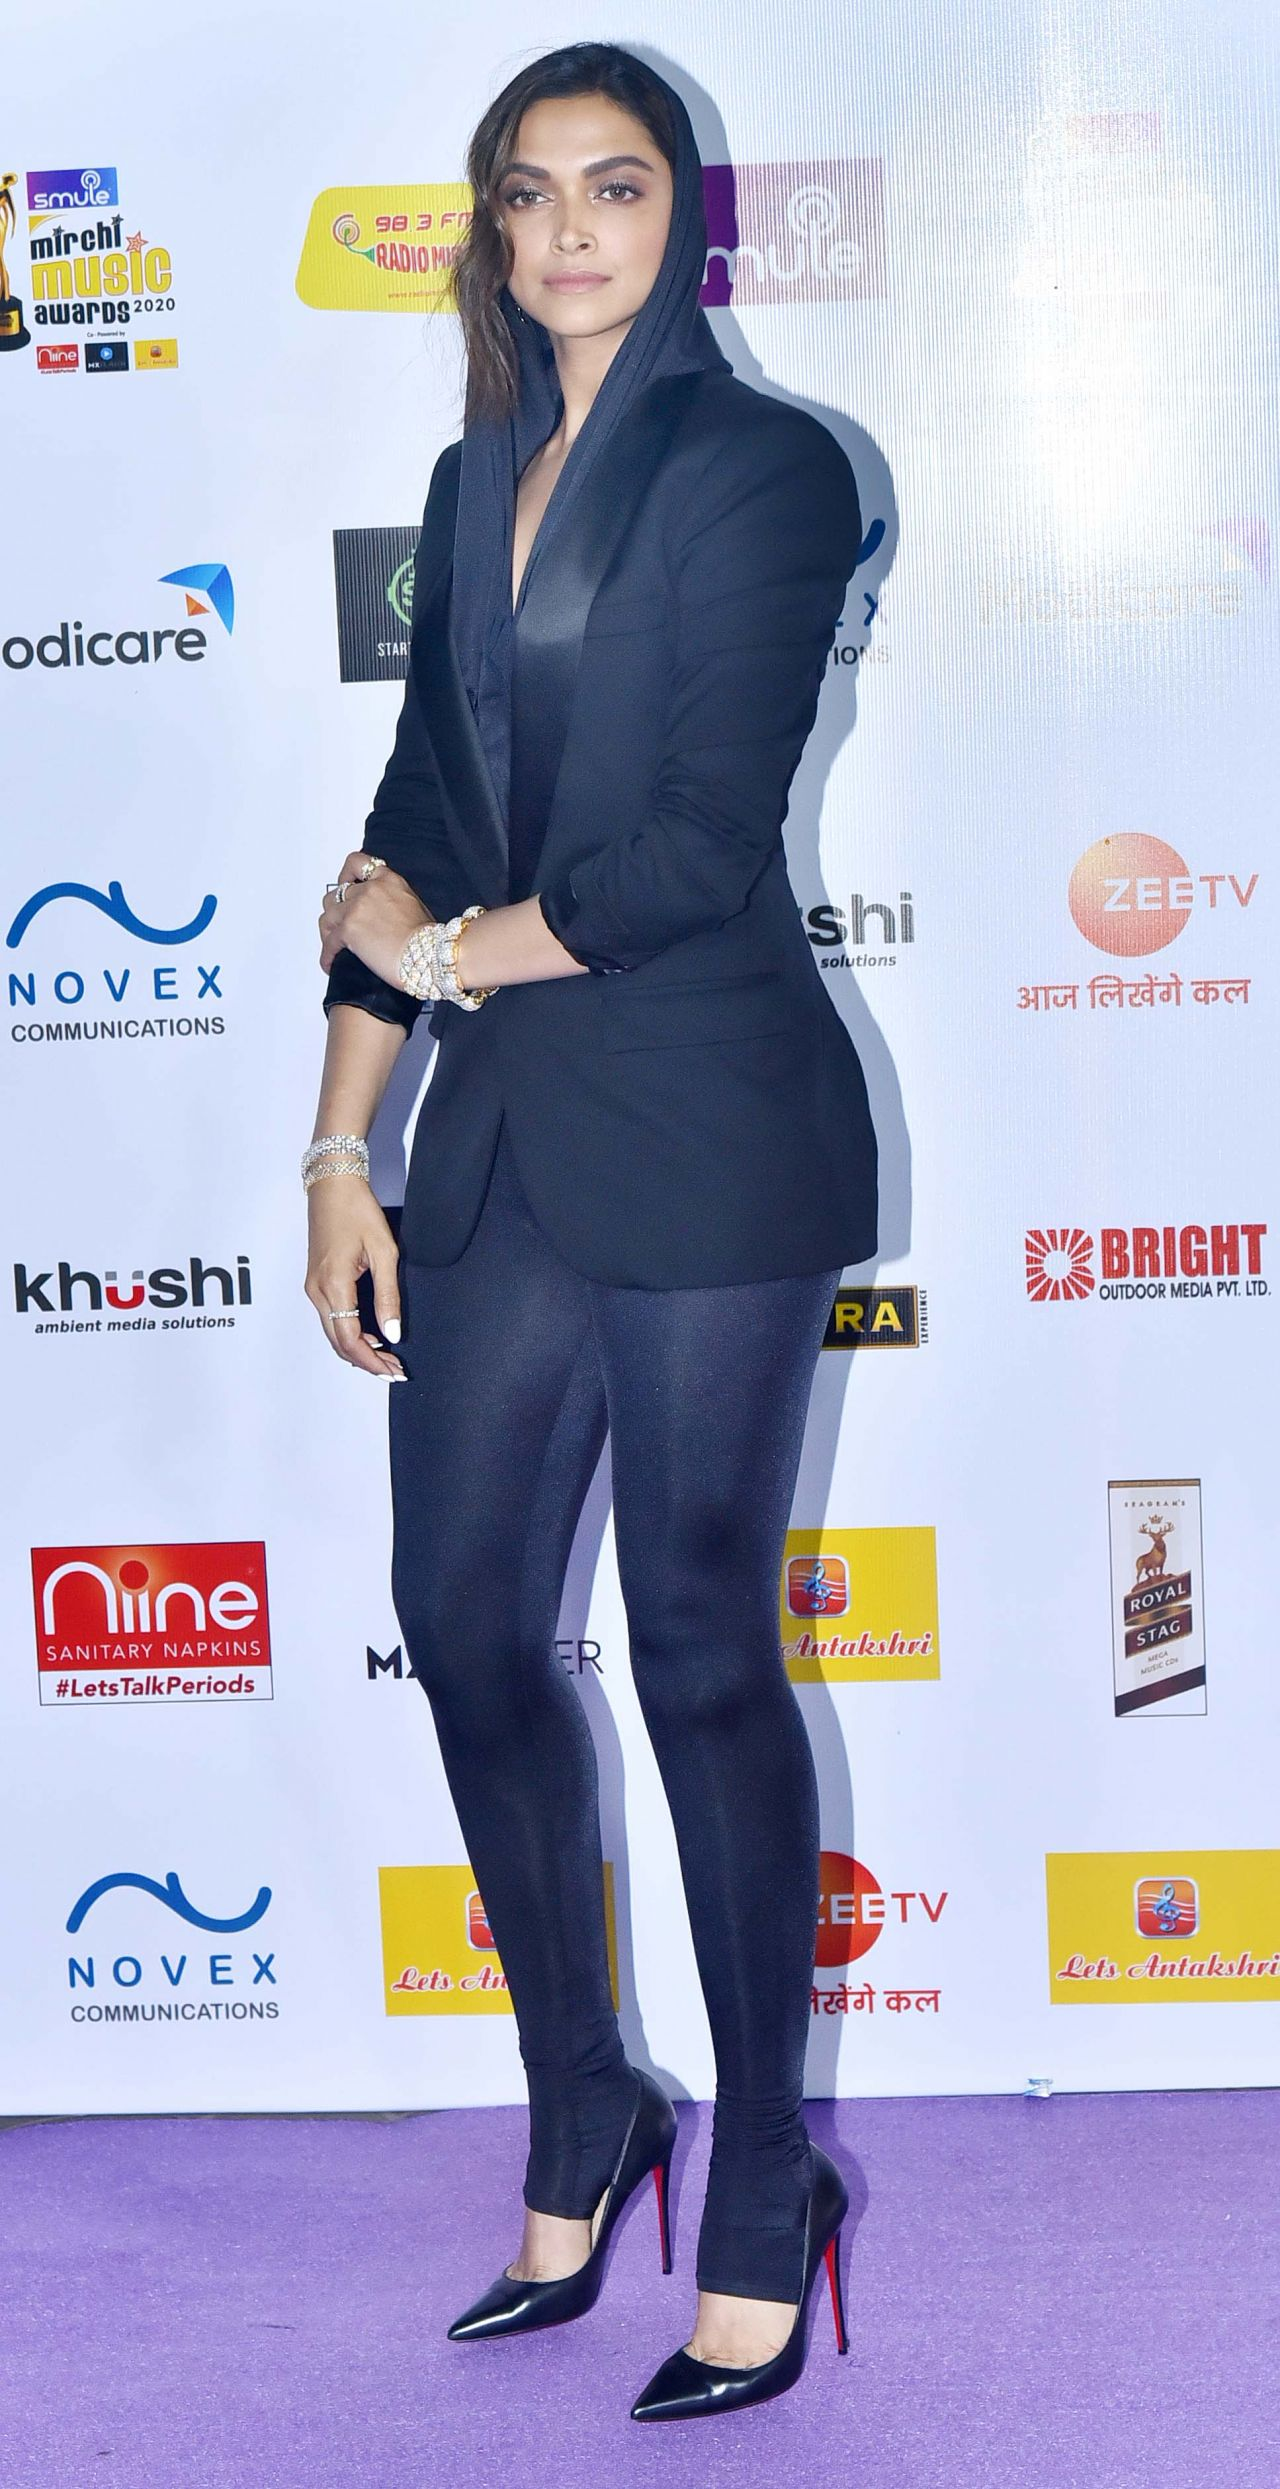 Deepika Padukone Style, Clothes, Outfits and Fashion ...